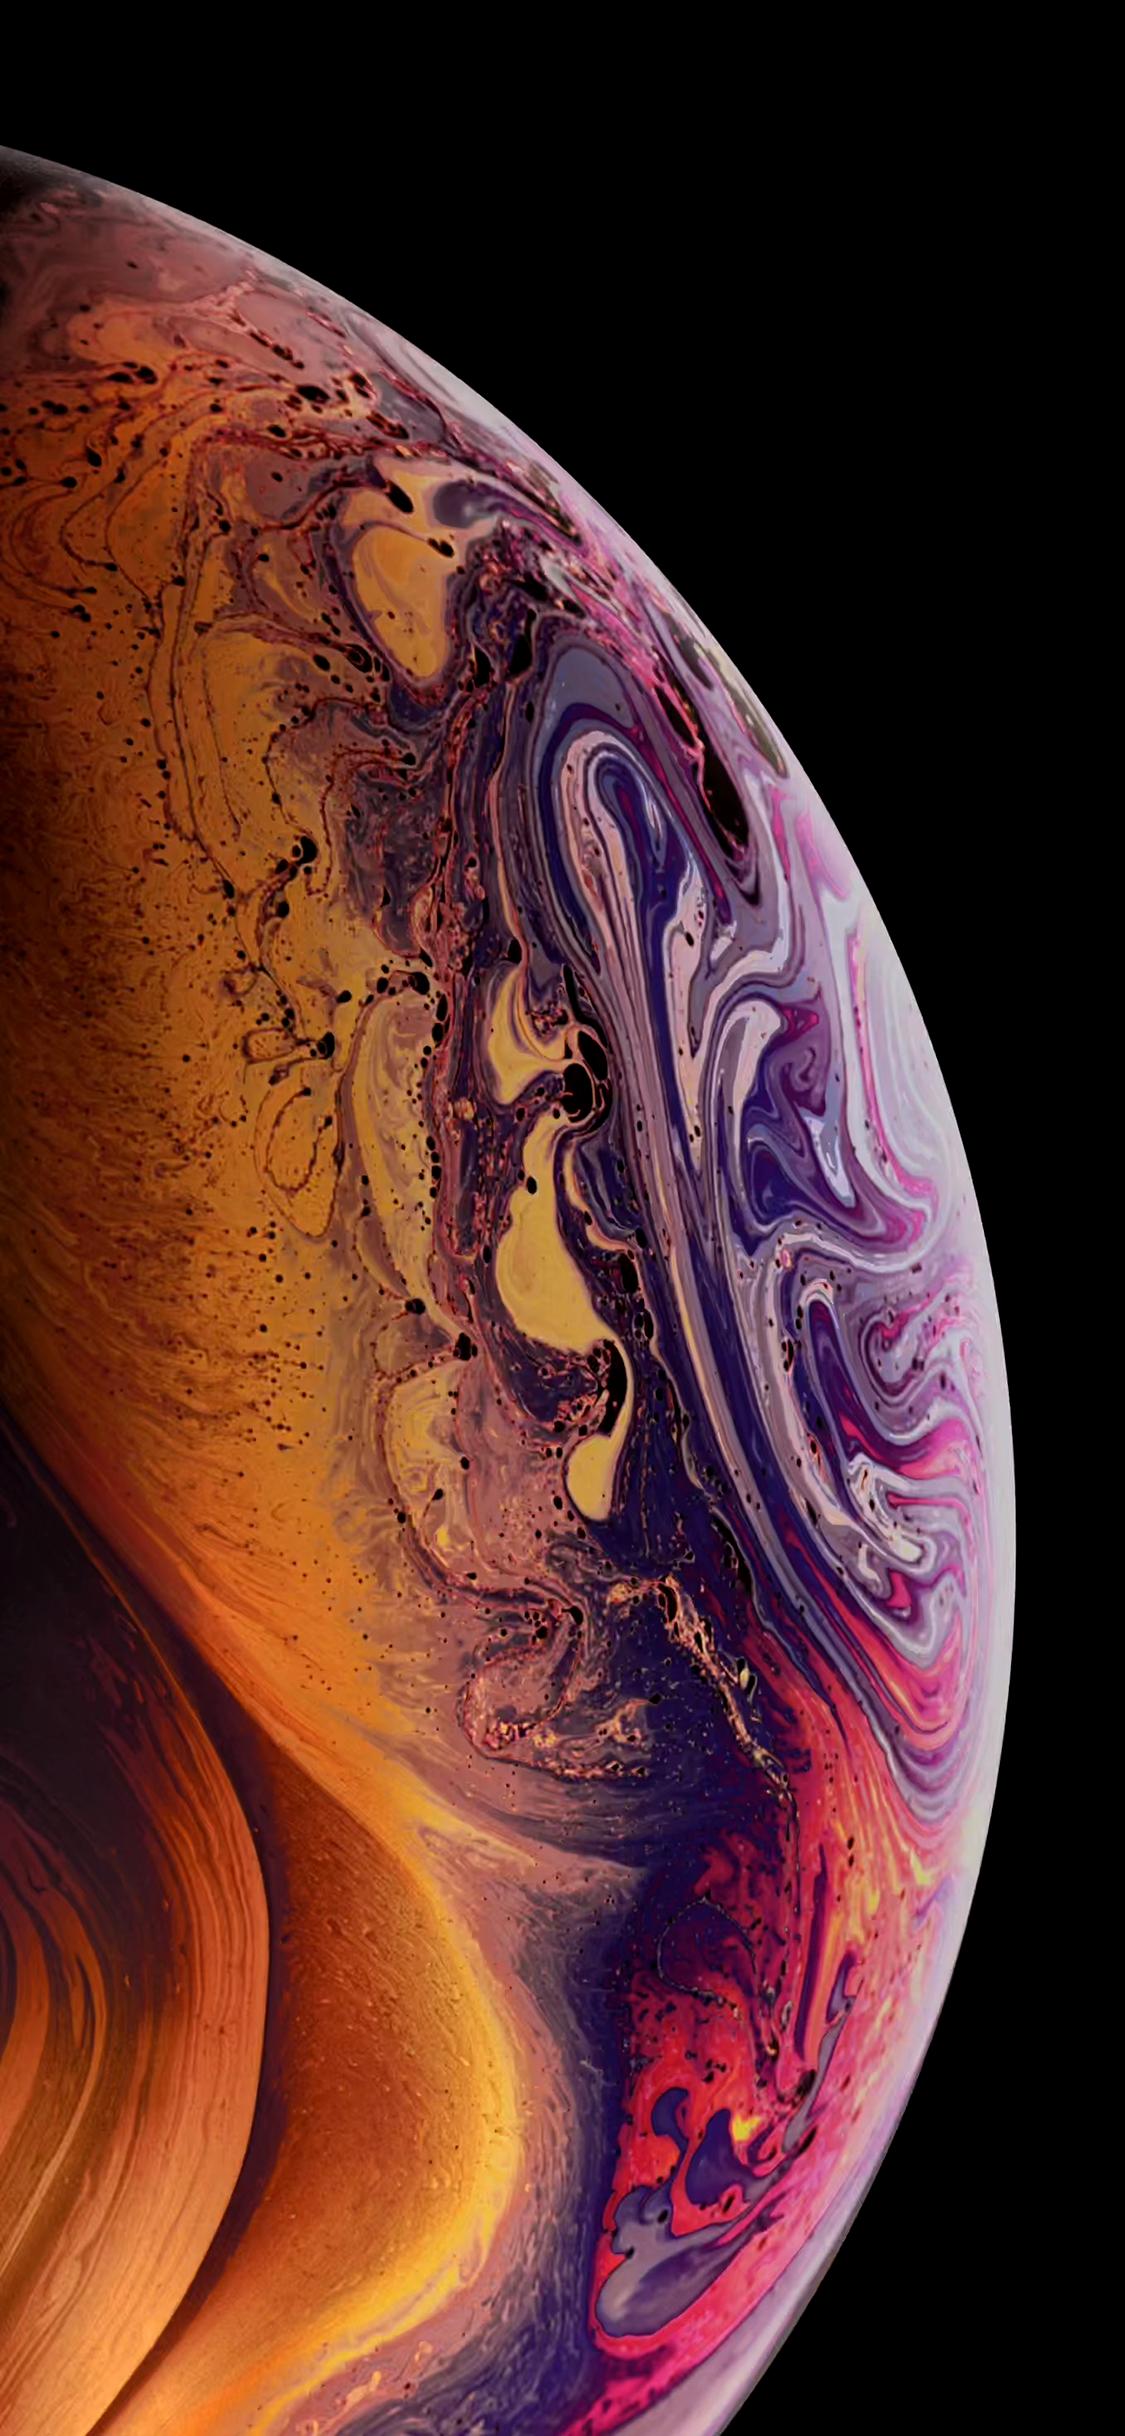 Iphone Xs Max Live Wallpaper 4K Download Ideas